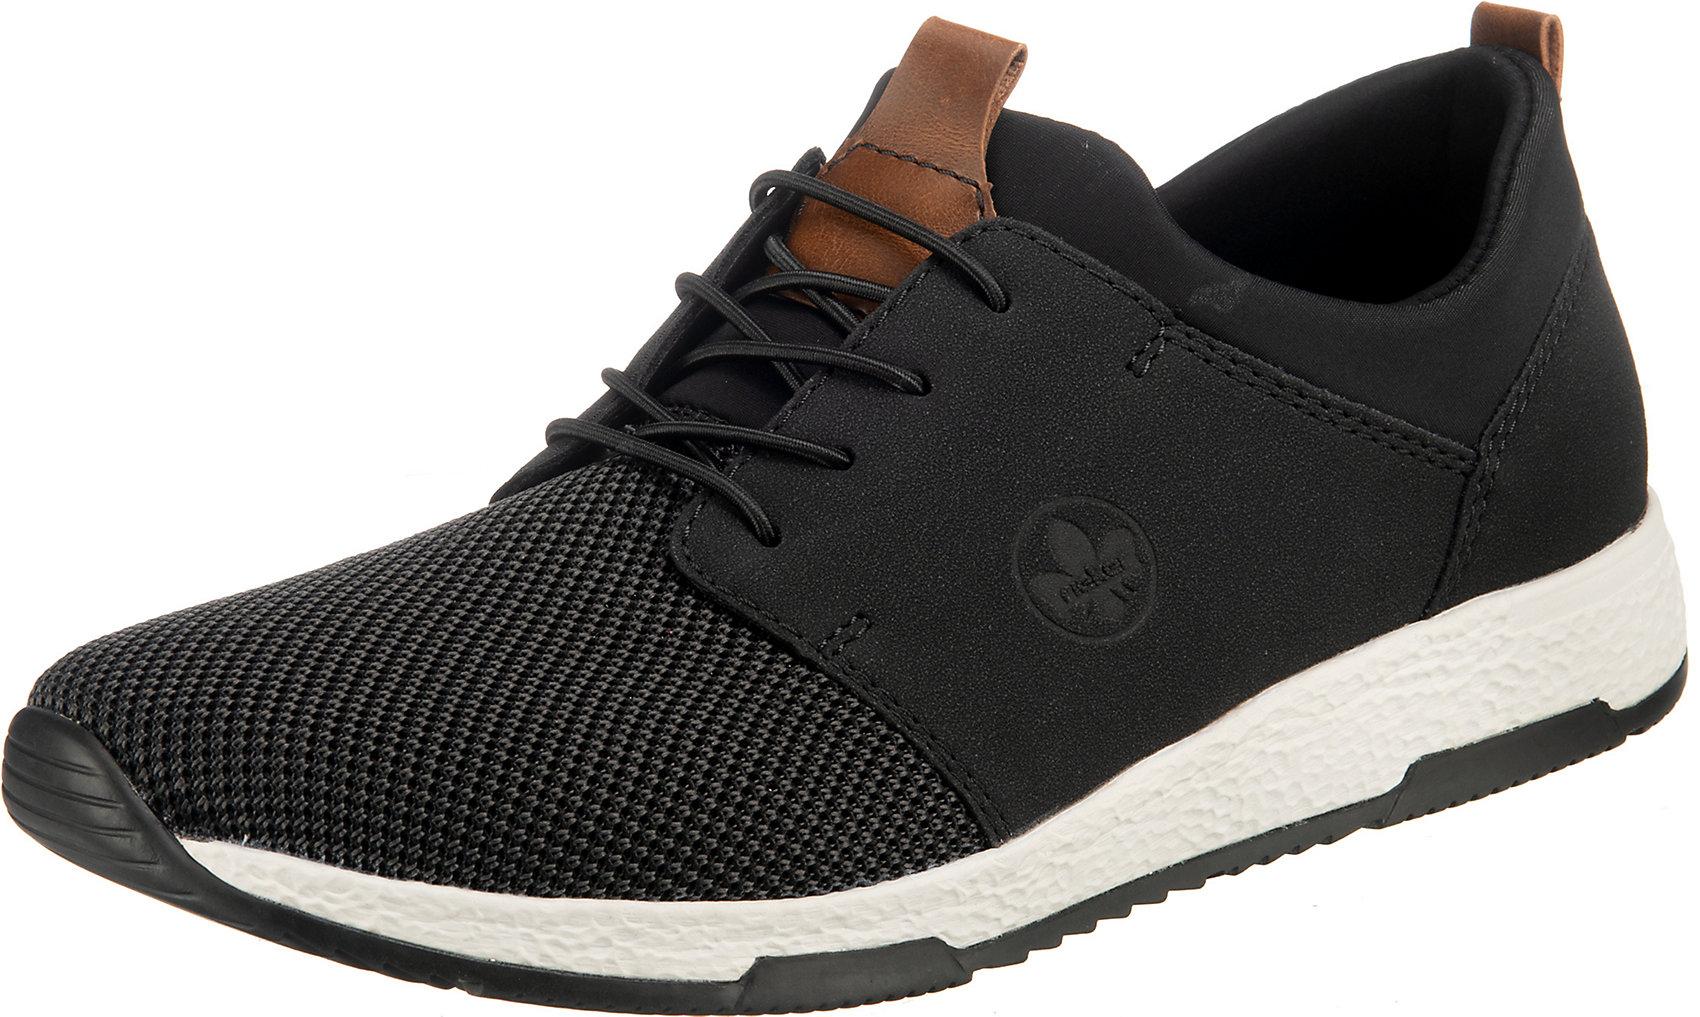 Indexbild 8 - Neu rieker Sneakers Low 12842477 für Herren schwarz